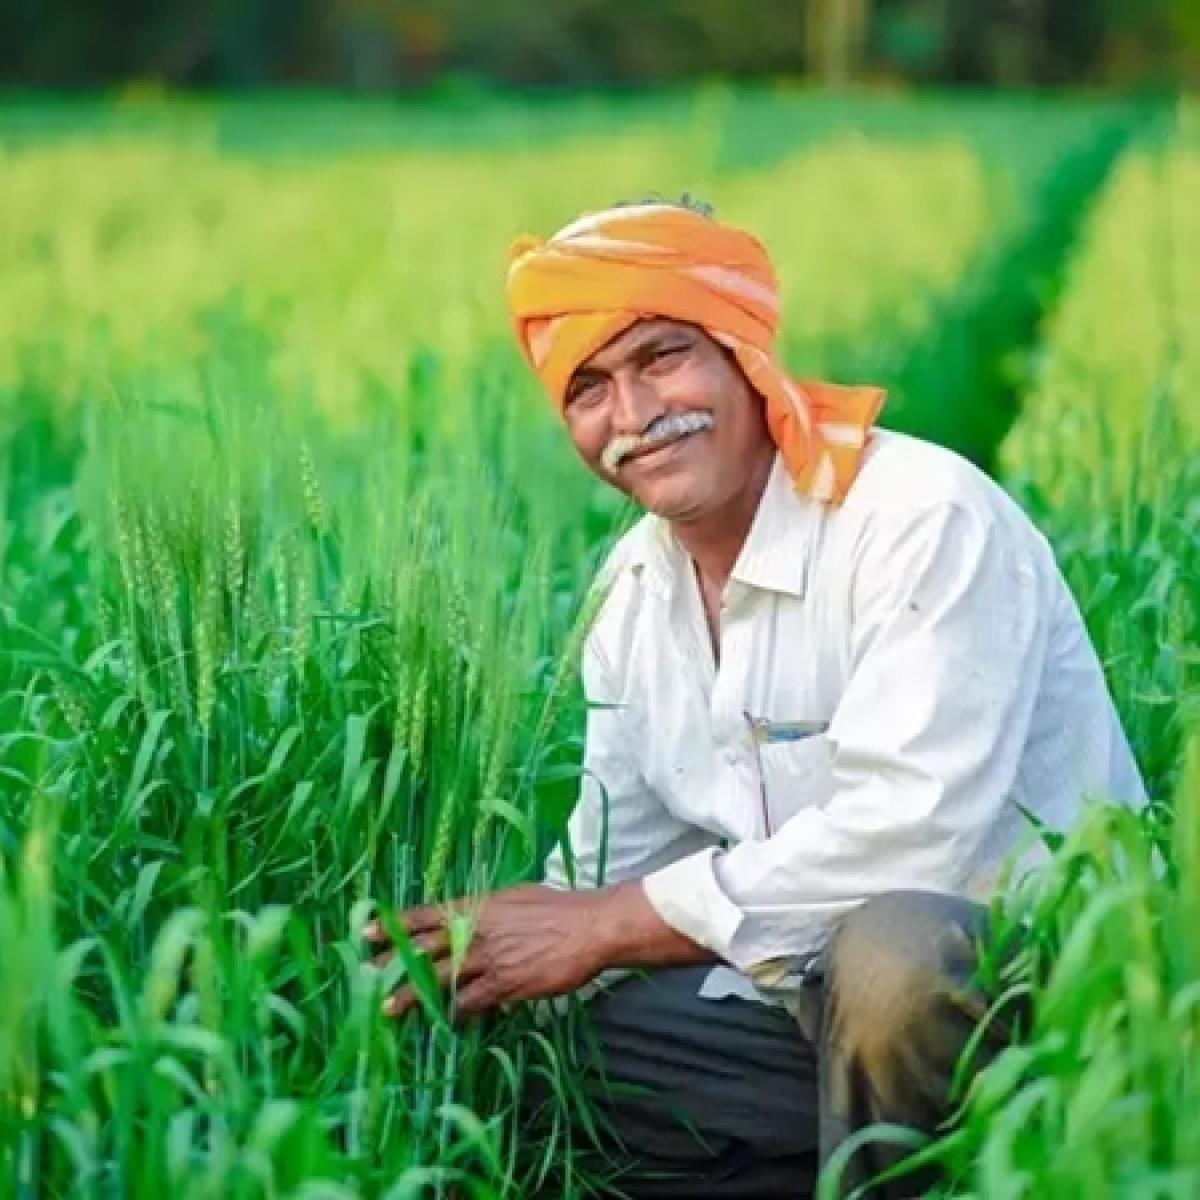 Madhya Pradesh: CM Shivraj Singh Chauhan gives Rs 2981.24 crore of crop insurance to 15 lakh farmers online